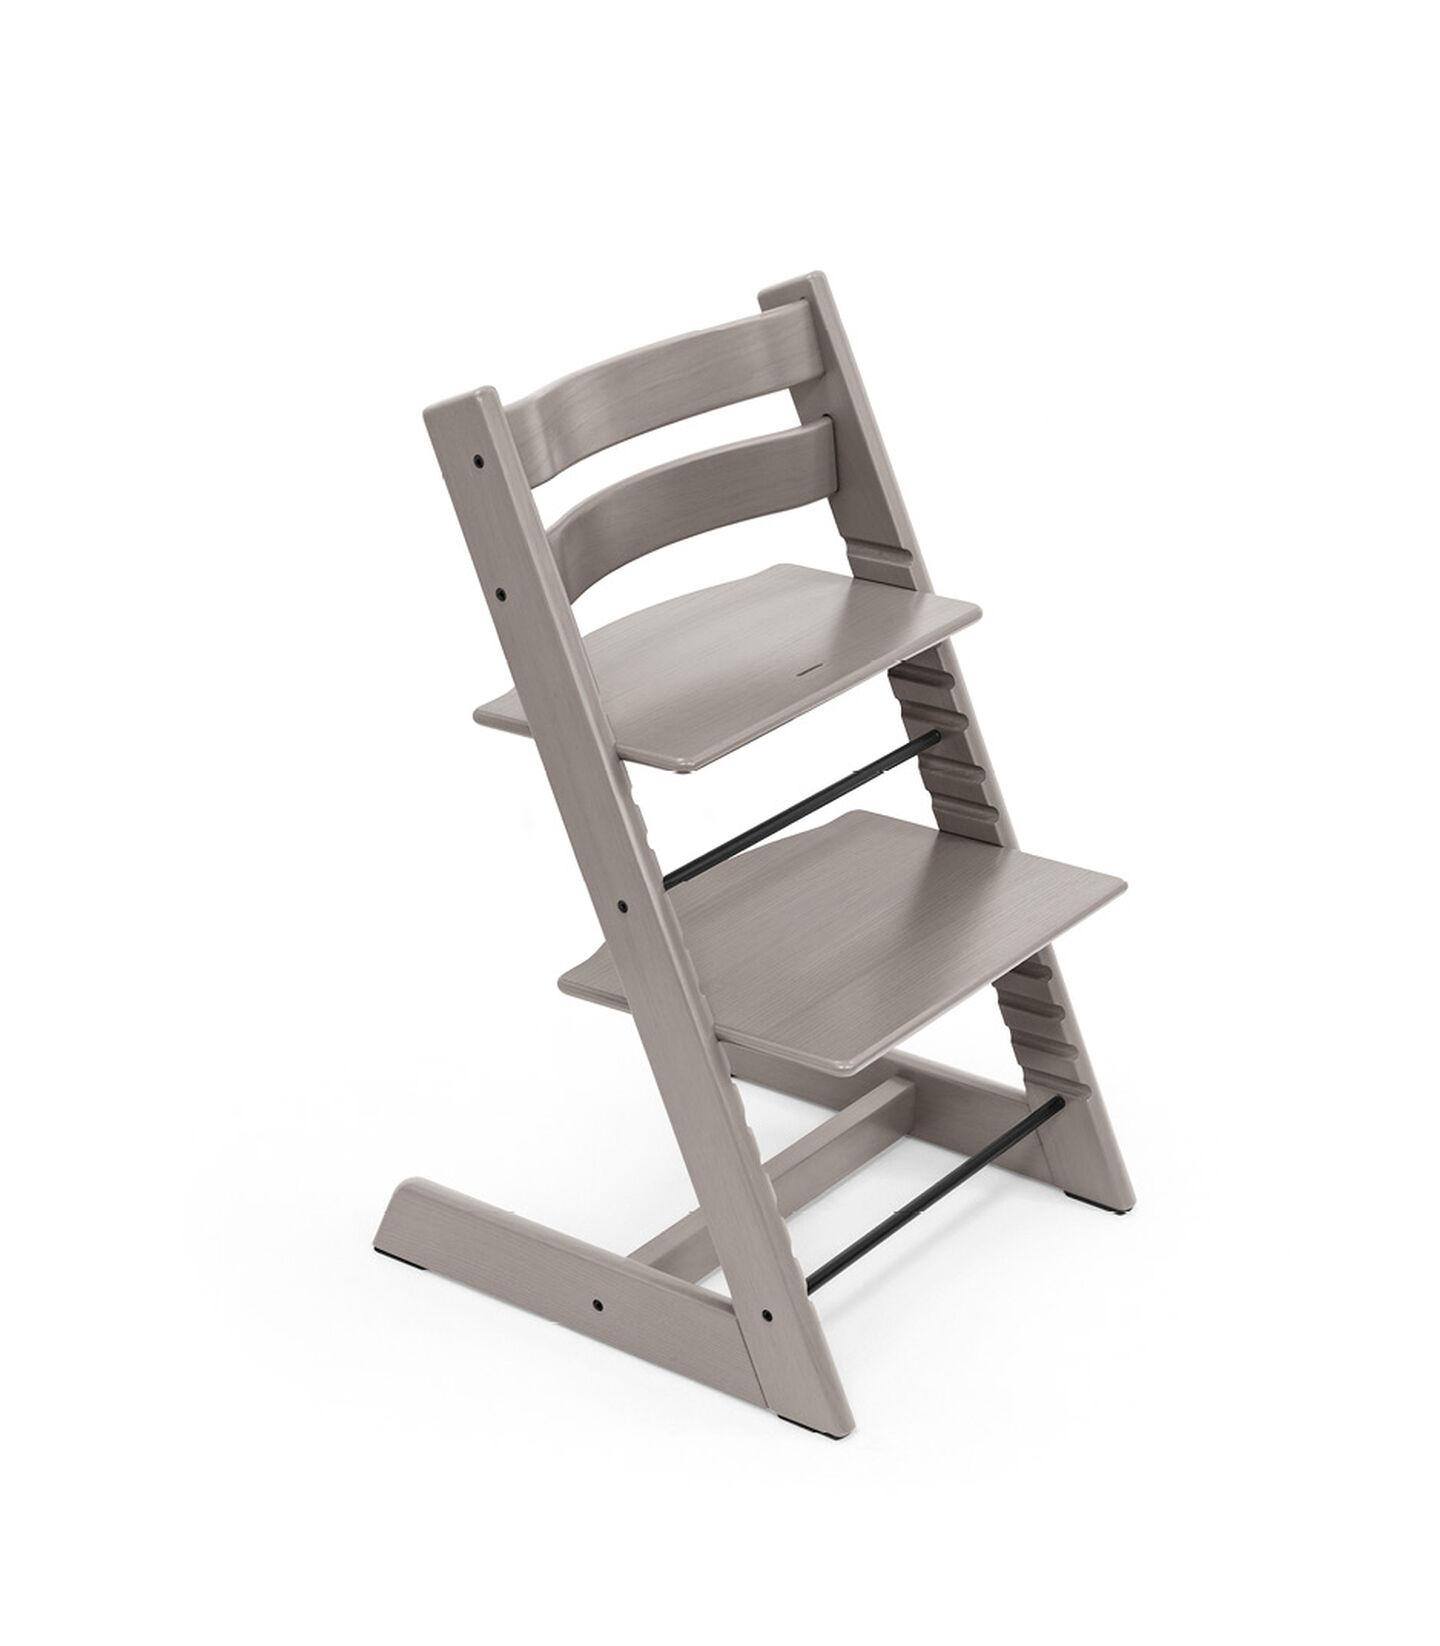 Tripp Trapp® Chair Oak Greywash, Oak Greywash, mainview view 2